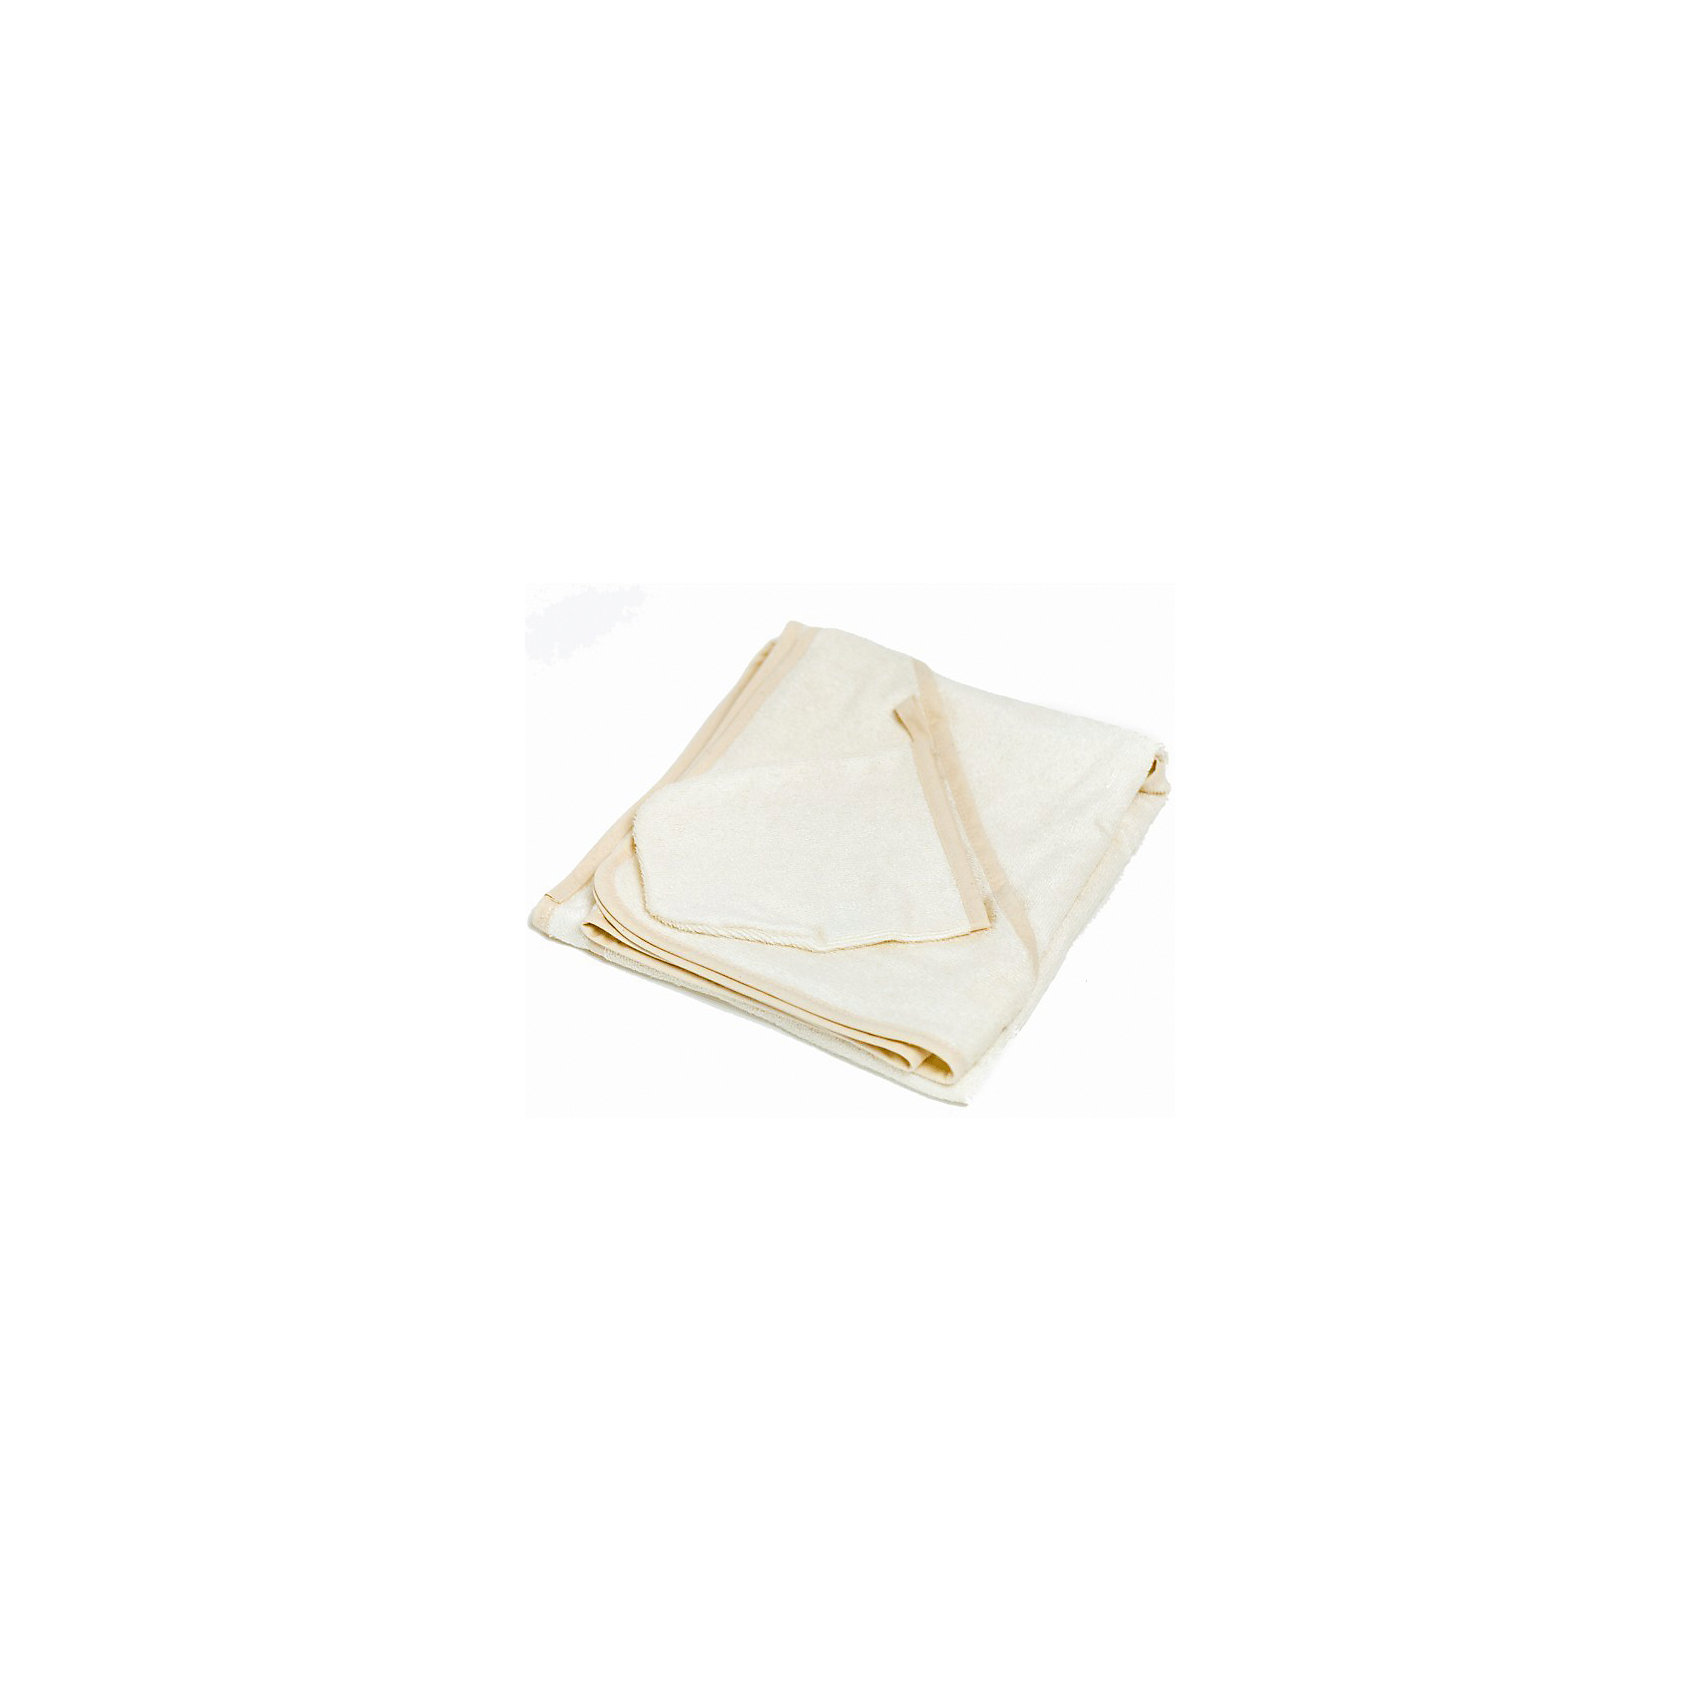 Italbaby Махровое полотенце 100/100, Italbaby, бежевый полотенца банные aisha махровое полотенце бежевый 40 70 100